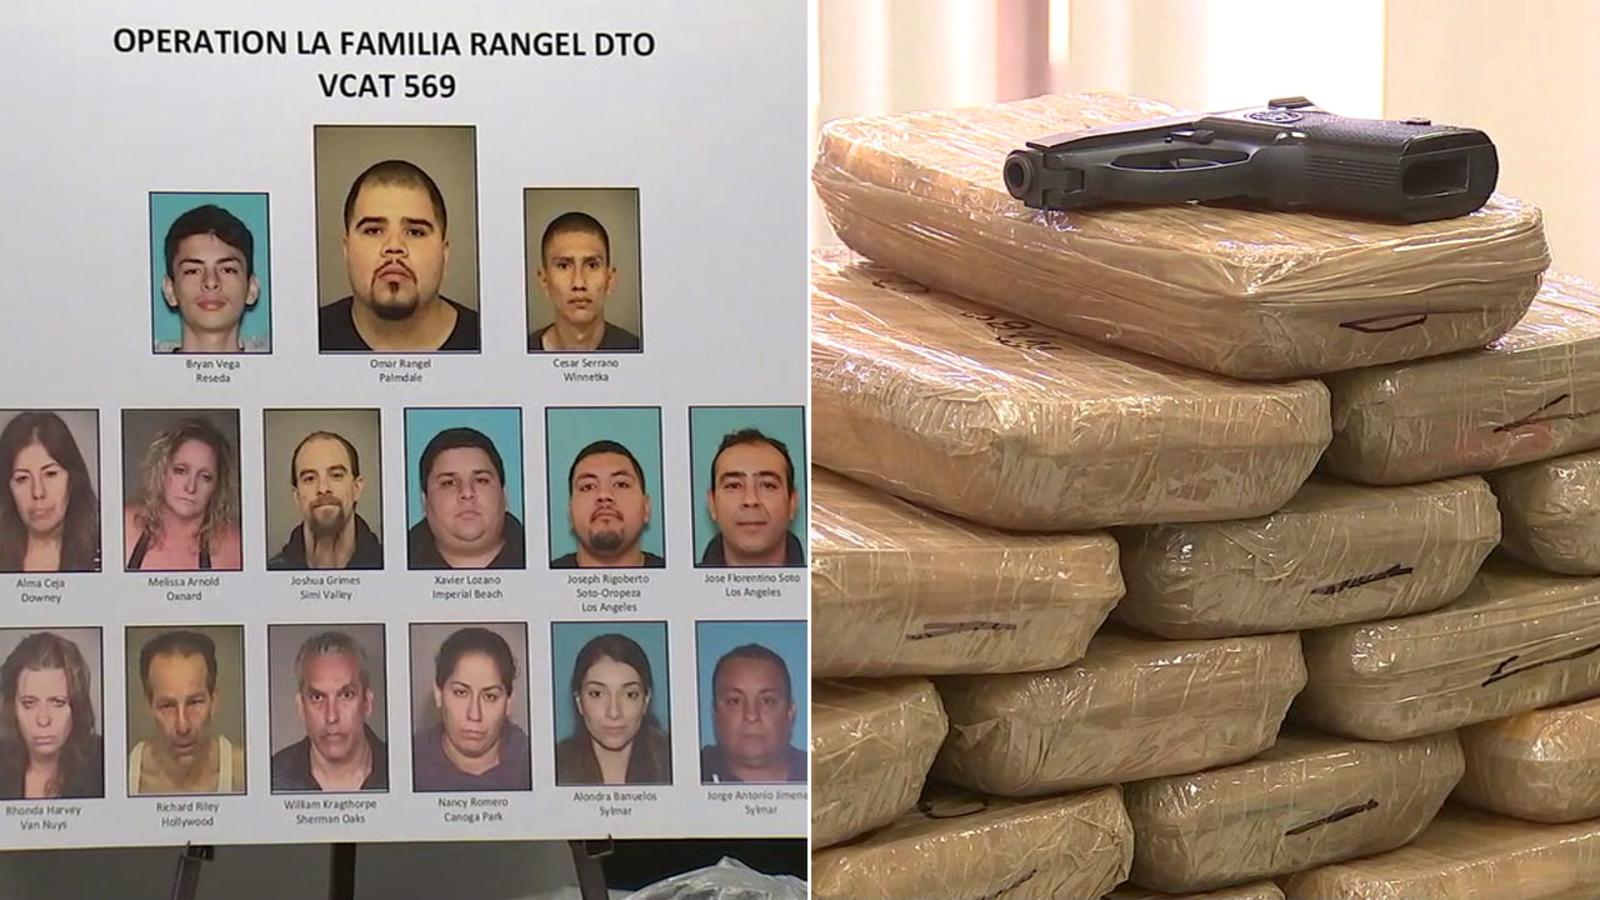 Sinaloa cartel members arrested in Ventura County drug bust operation